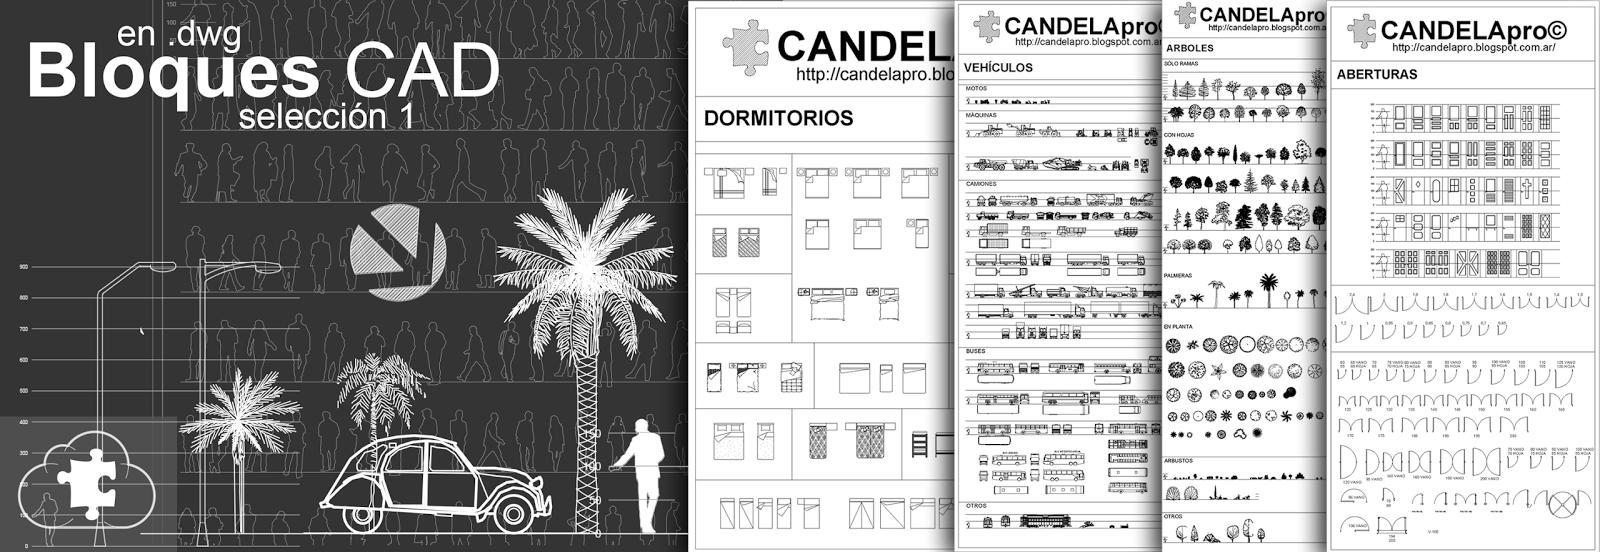 Bloques CAD | selección 1 | dwg |